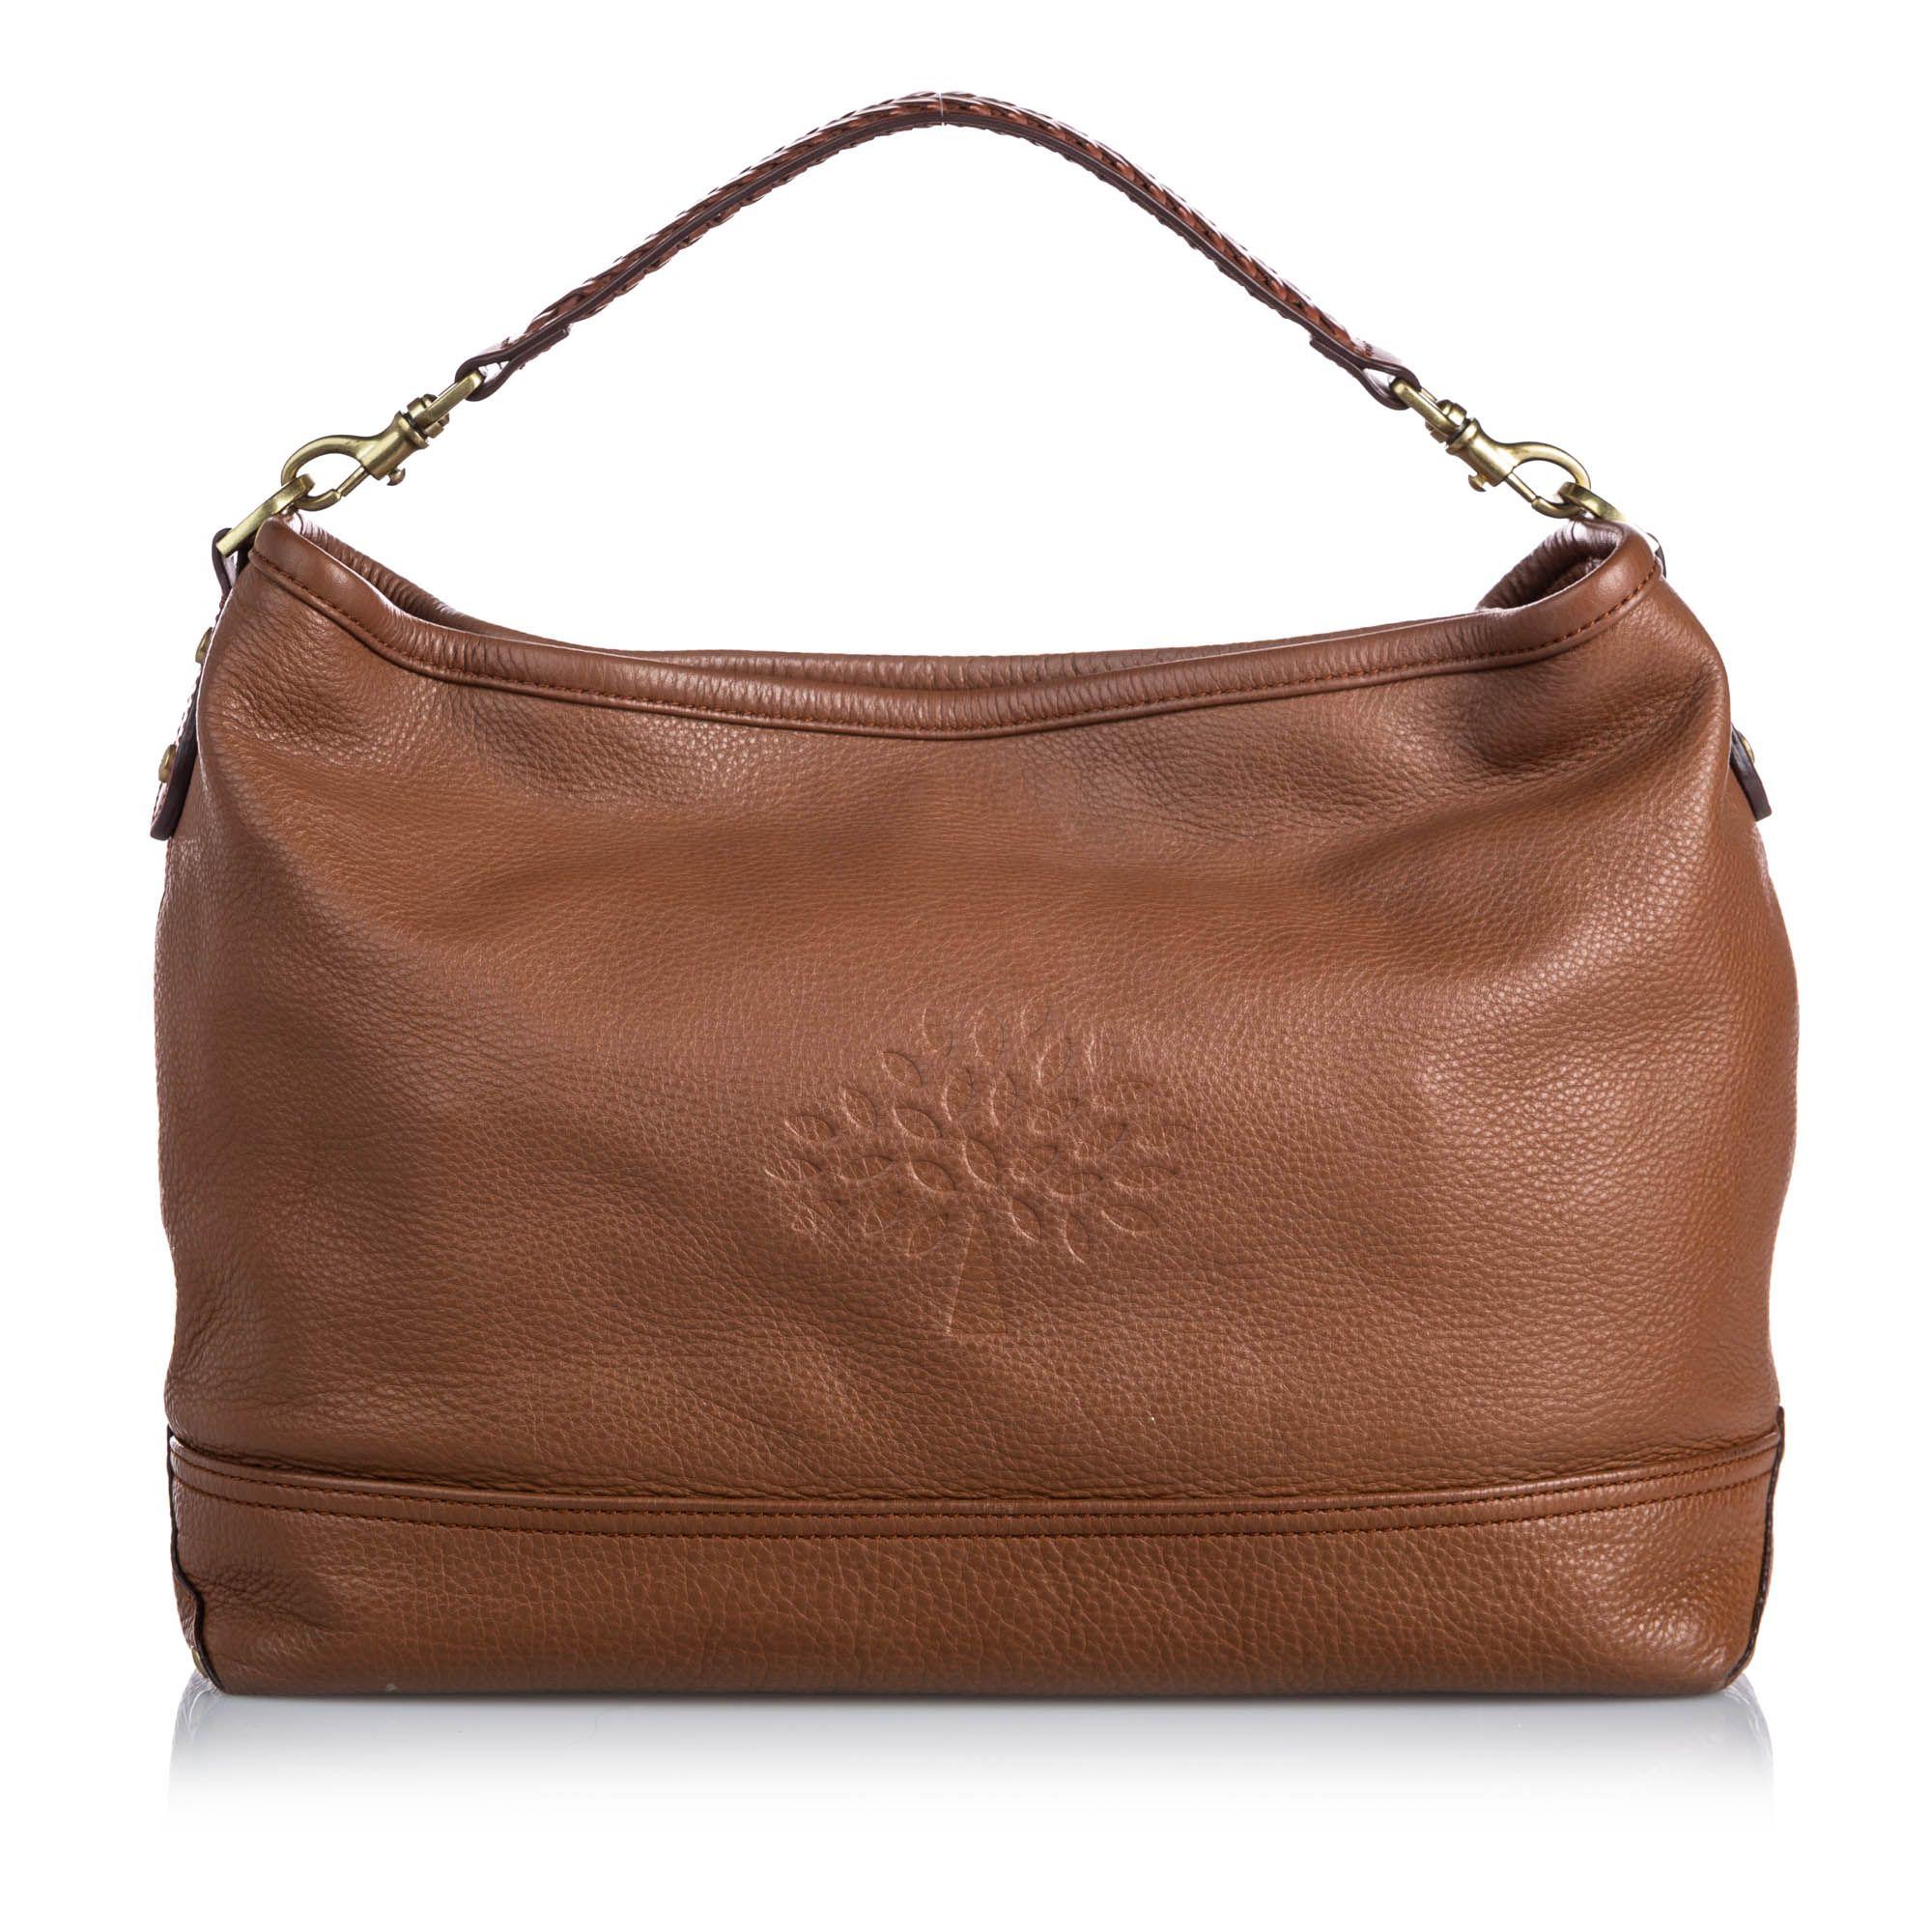 Vintage Mulberry Leather Effie Satchel Brown